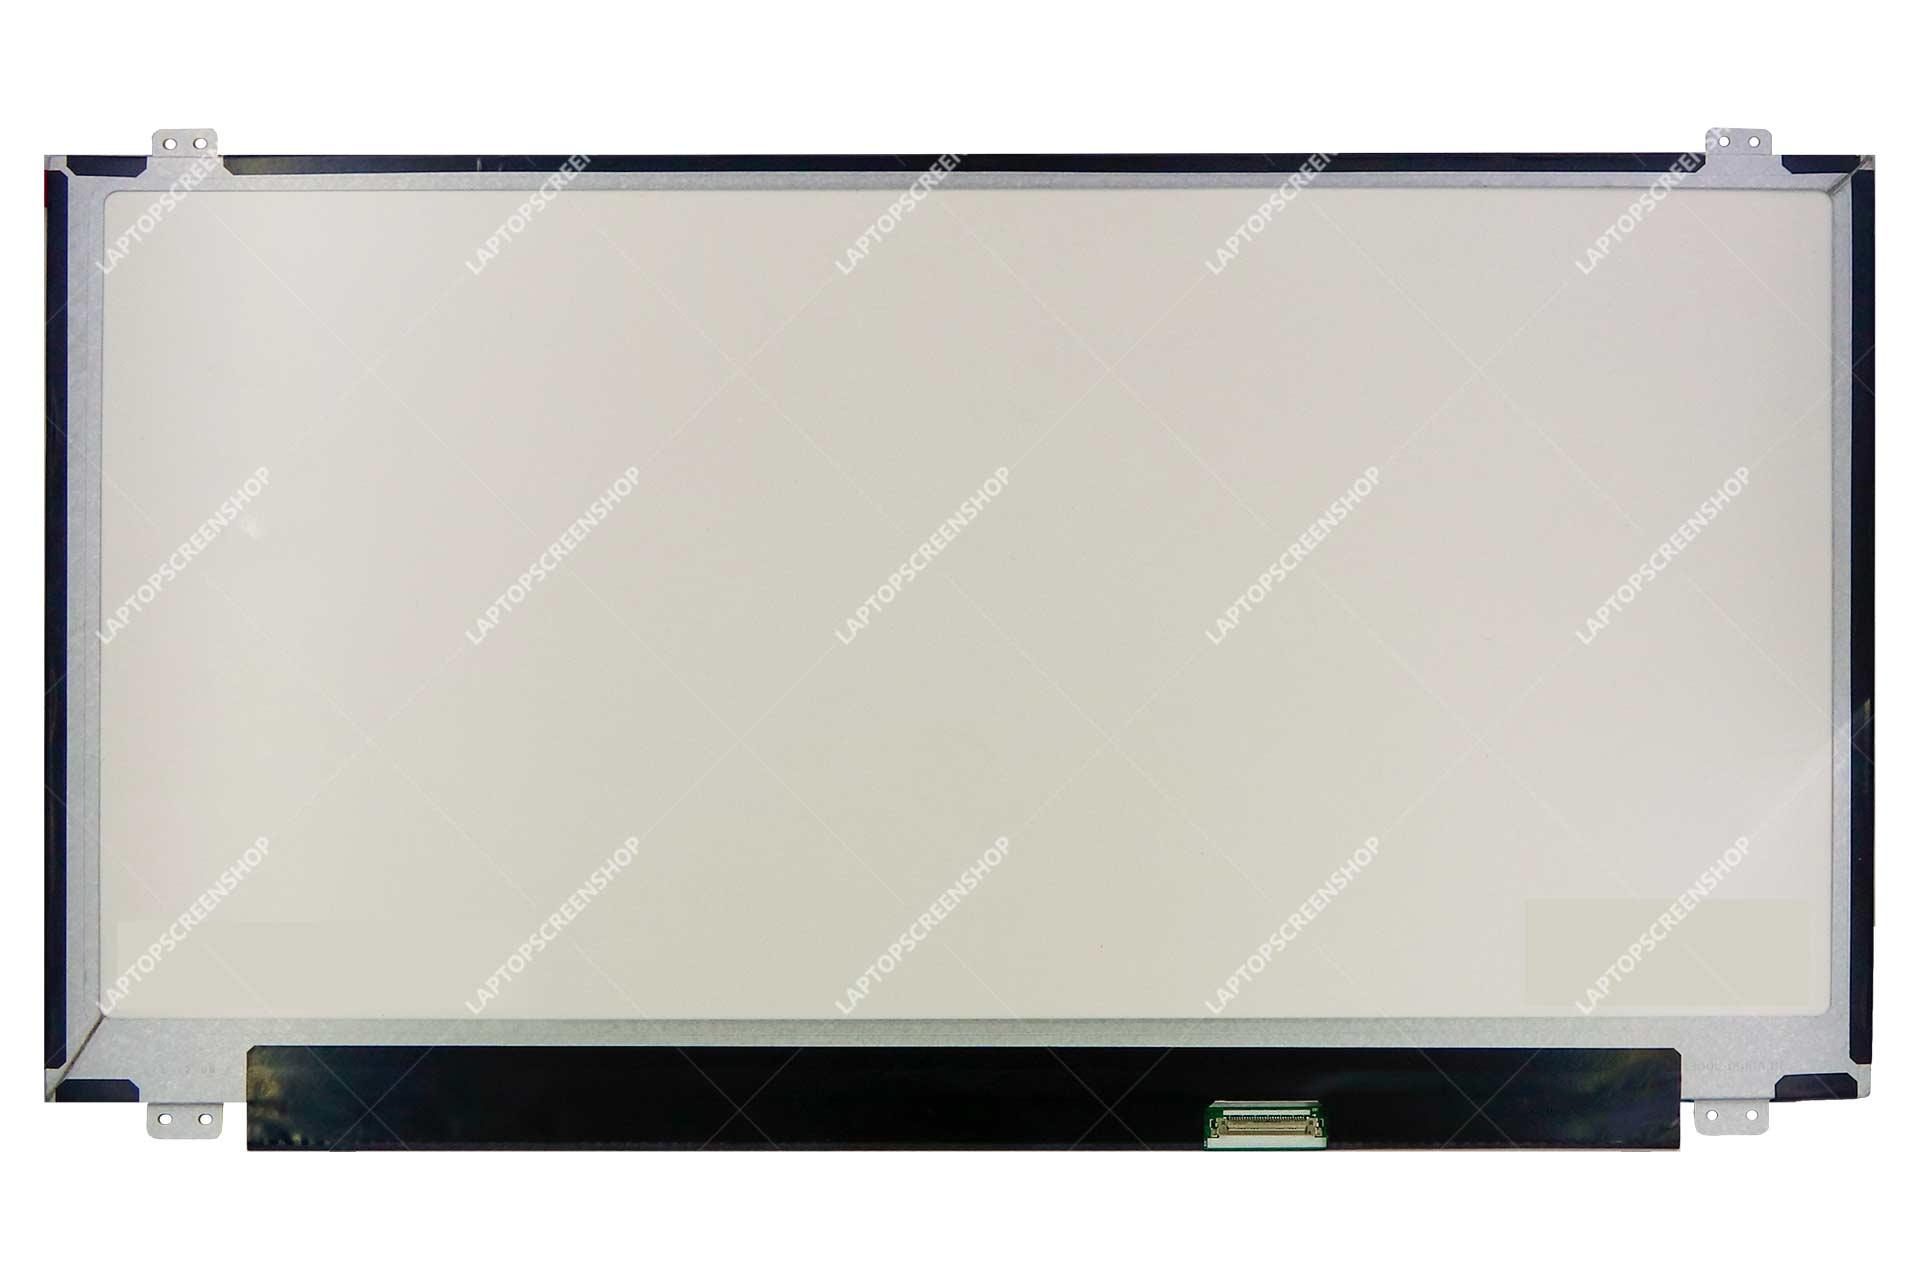 ACER-ASPIRE-E1-570G-6462-LCD  HD فروشگاه لپ تاپ اسکرين   تعمير لپ تاپ